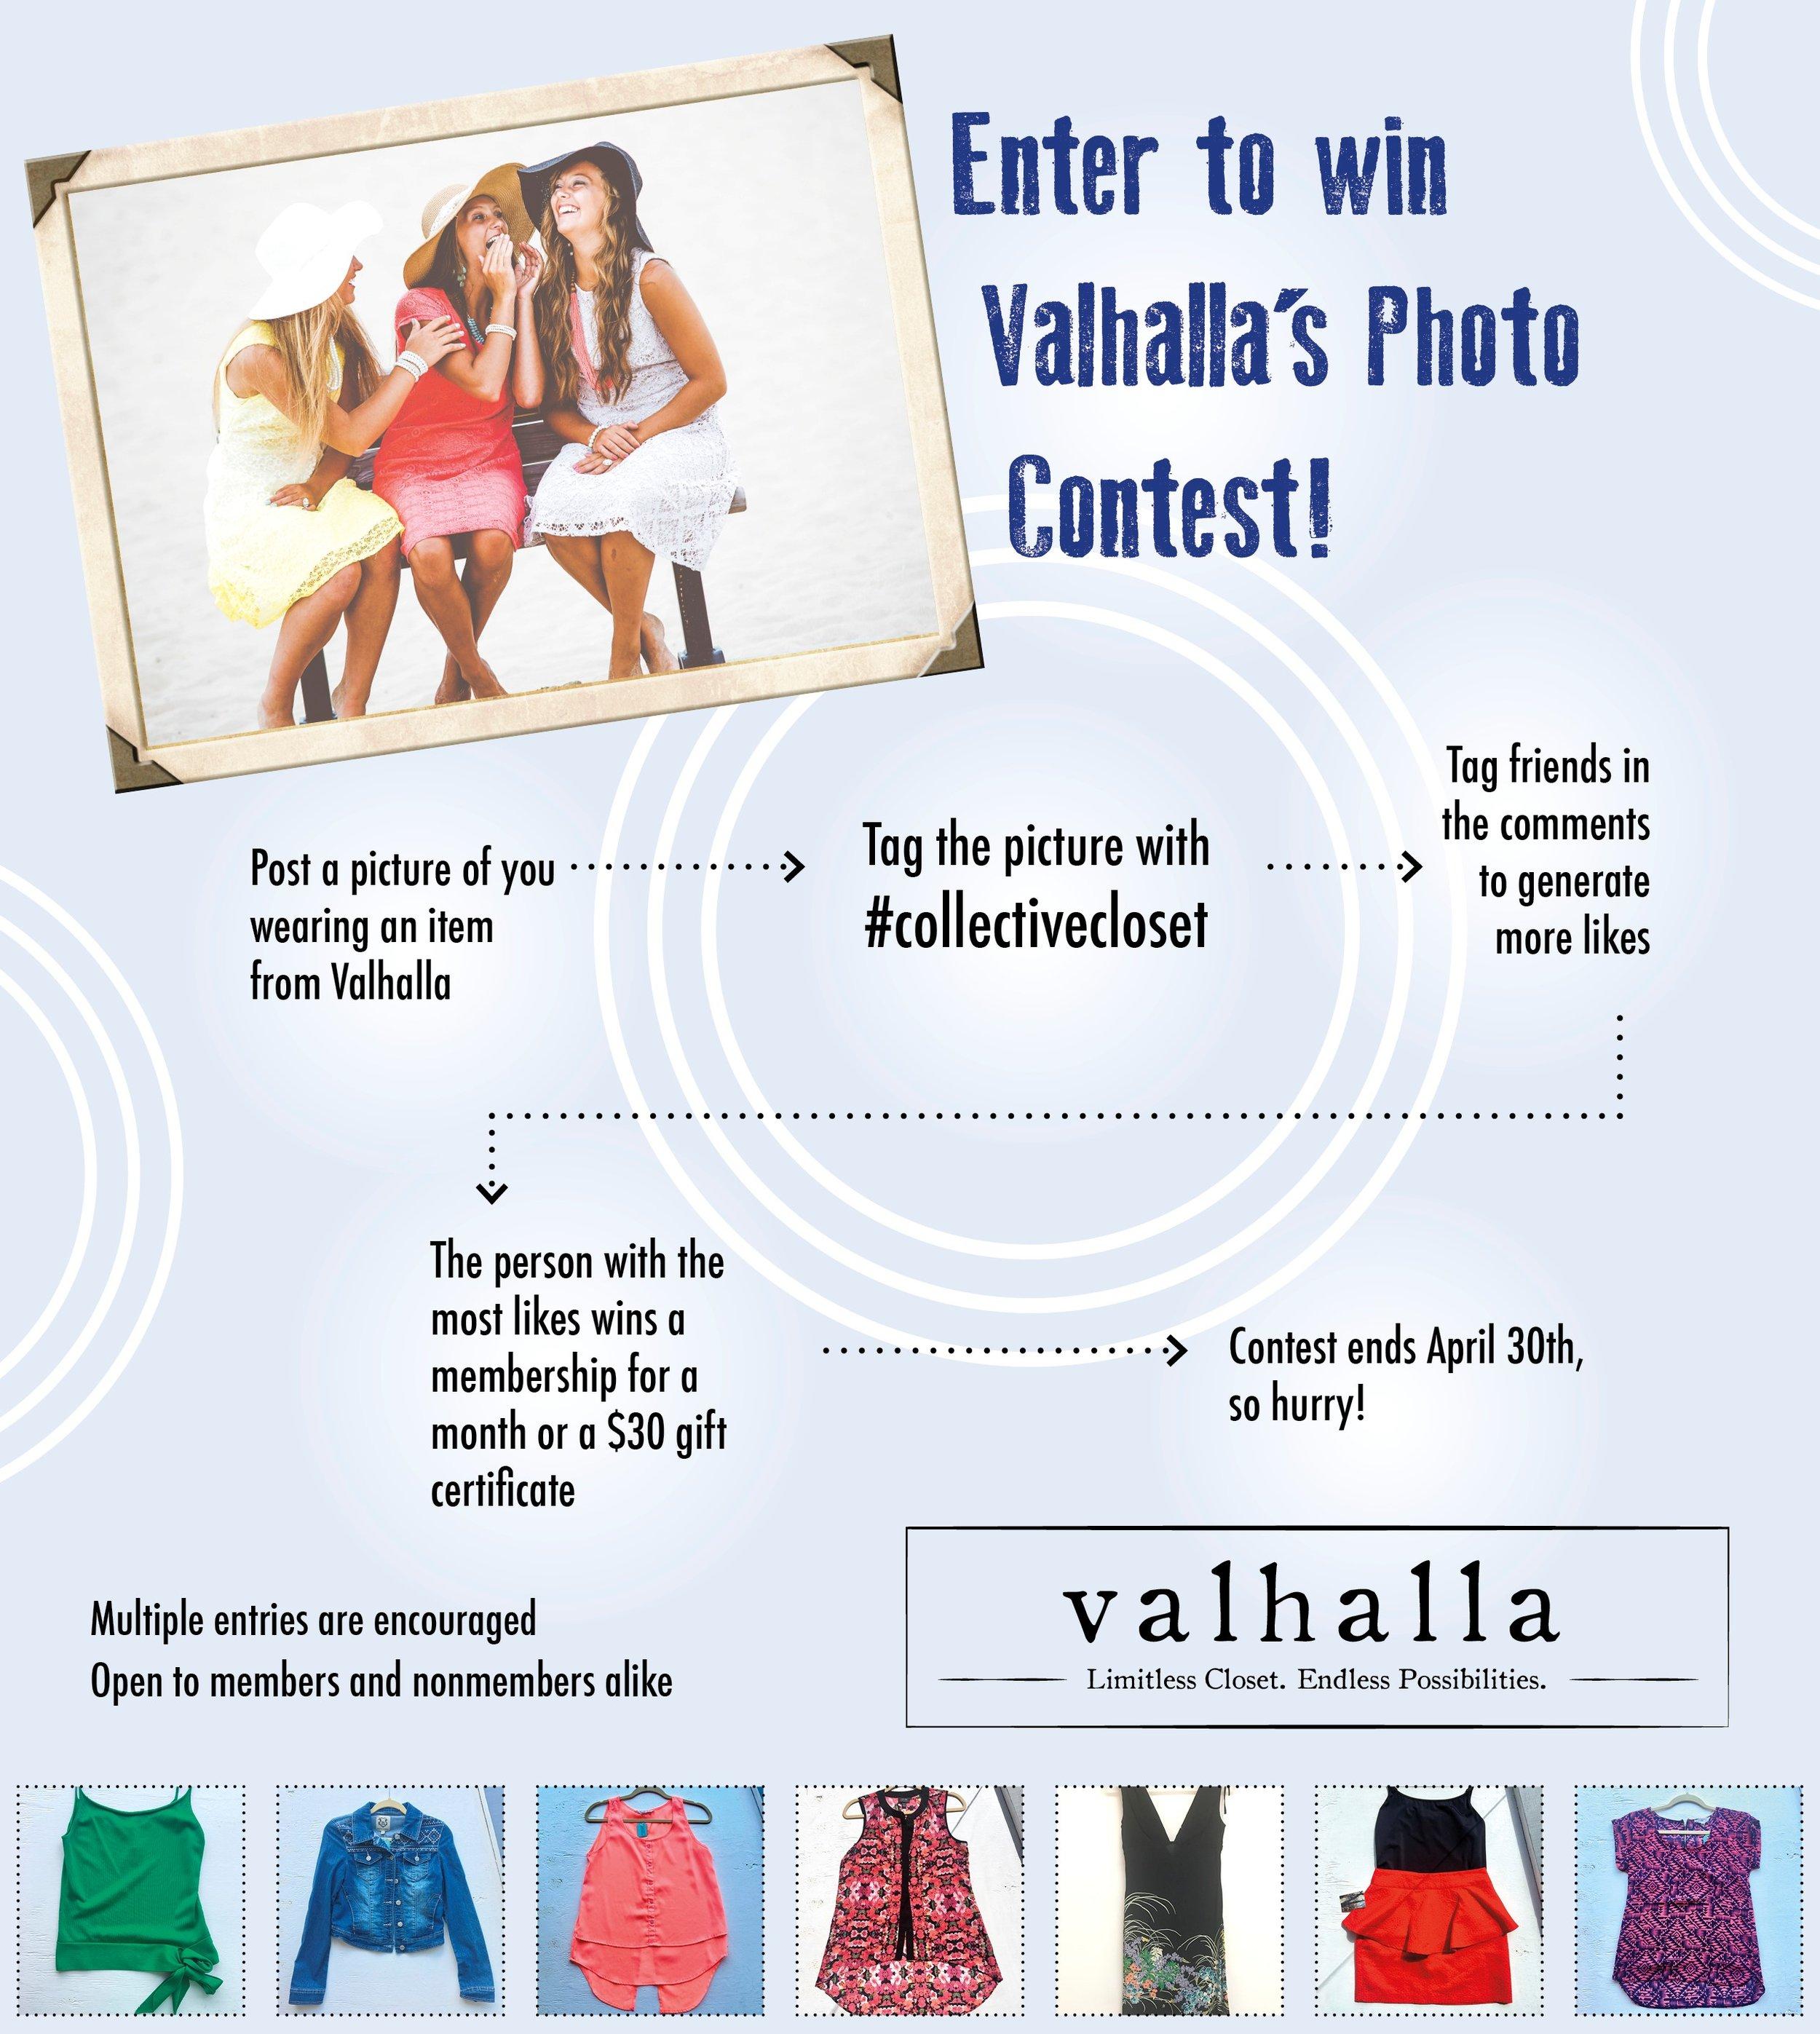 Valhalla Tampa Photo Contest